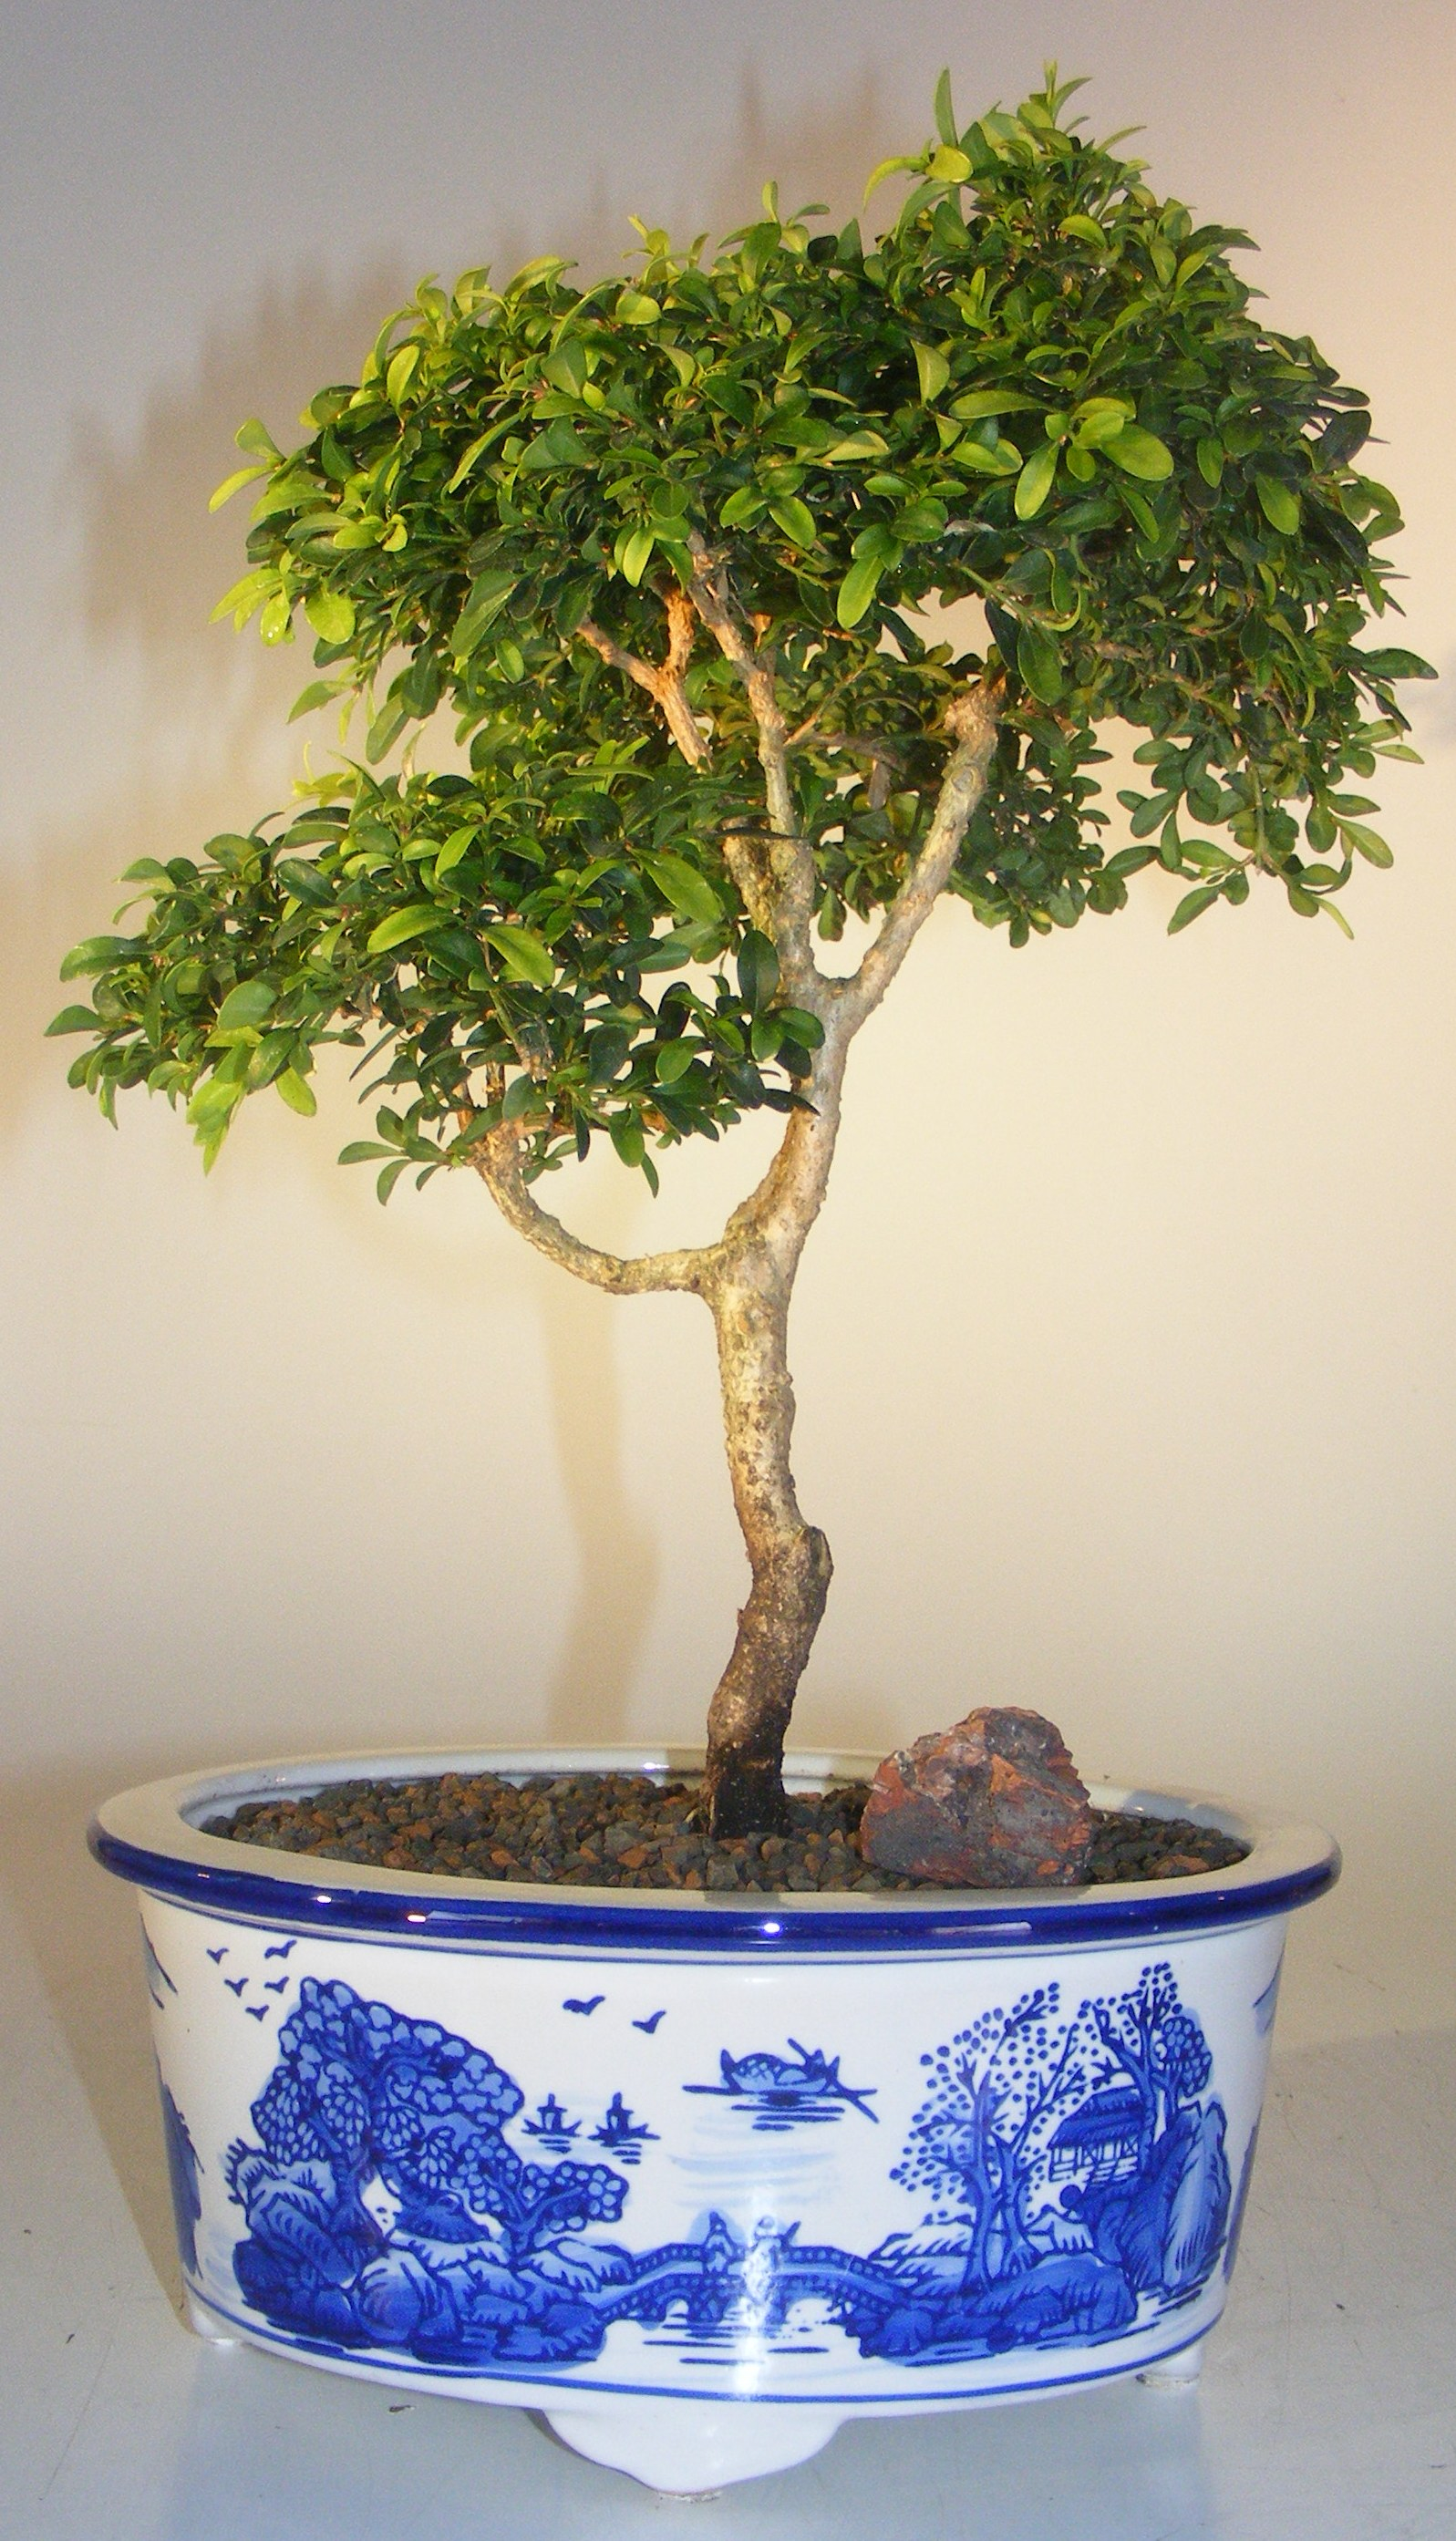 Japanese Kingsville Boxwood Bonsai Tree(buxus microphylla compacta) Image